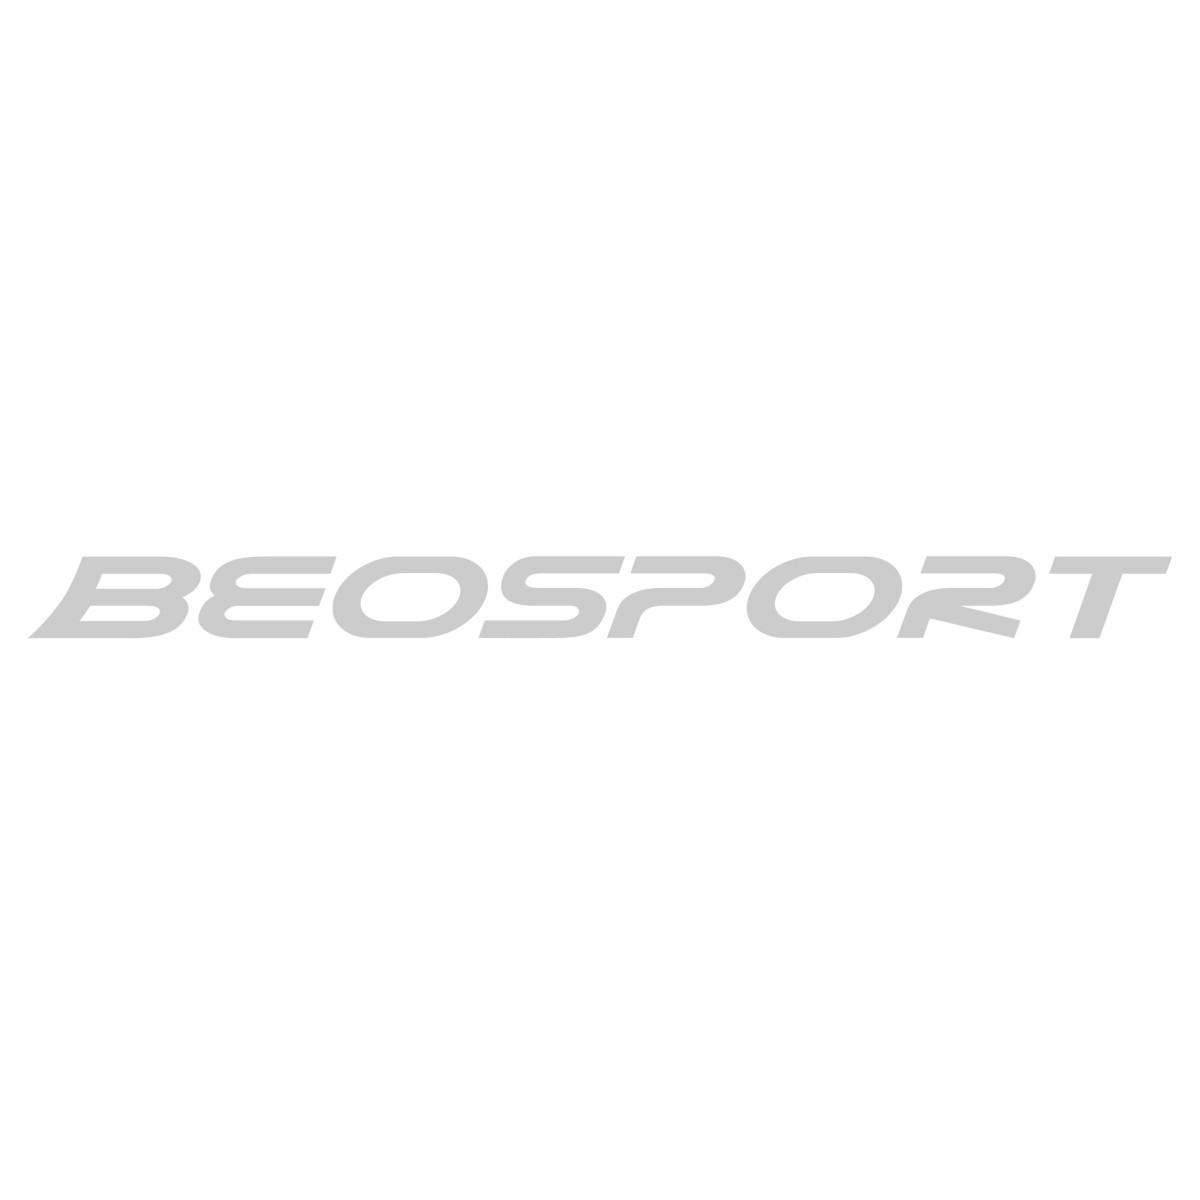 Pepe Jeans Ilford košulja